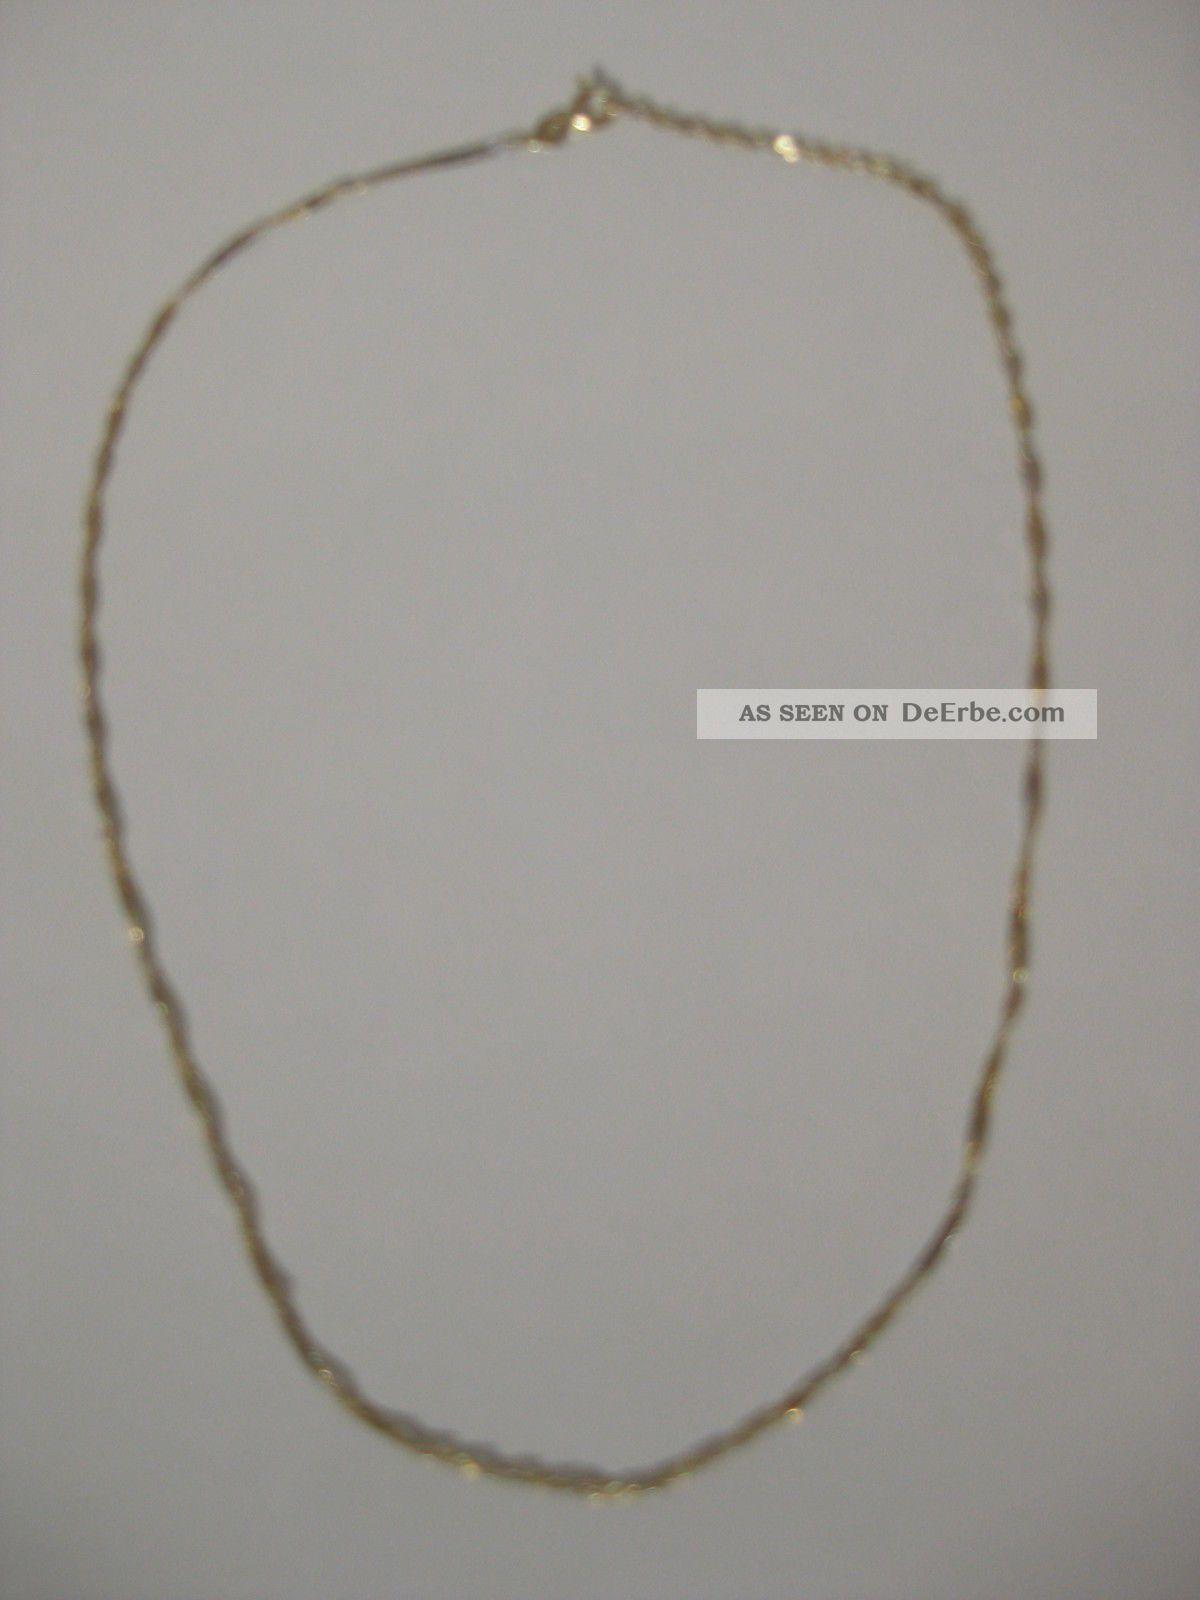 feine gelbgold weissgold kette gedreht 333 gold collier. Black Bedroom Furniture Sets. Home Design Ideas